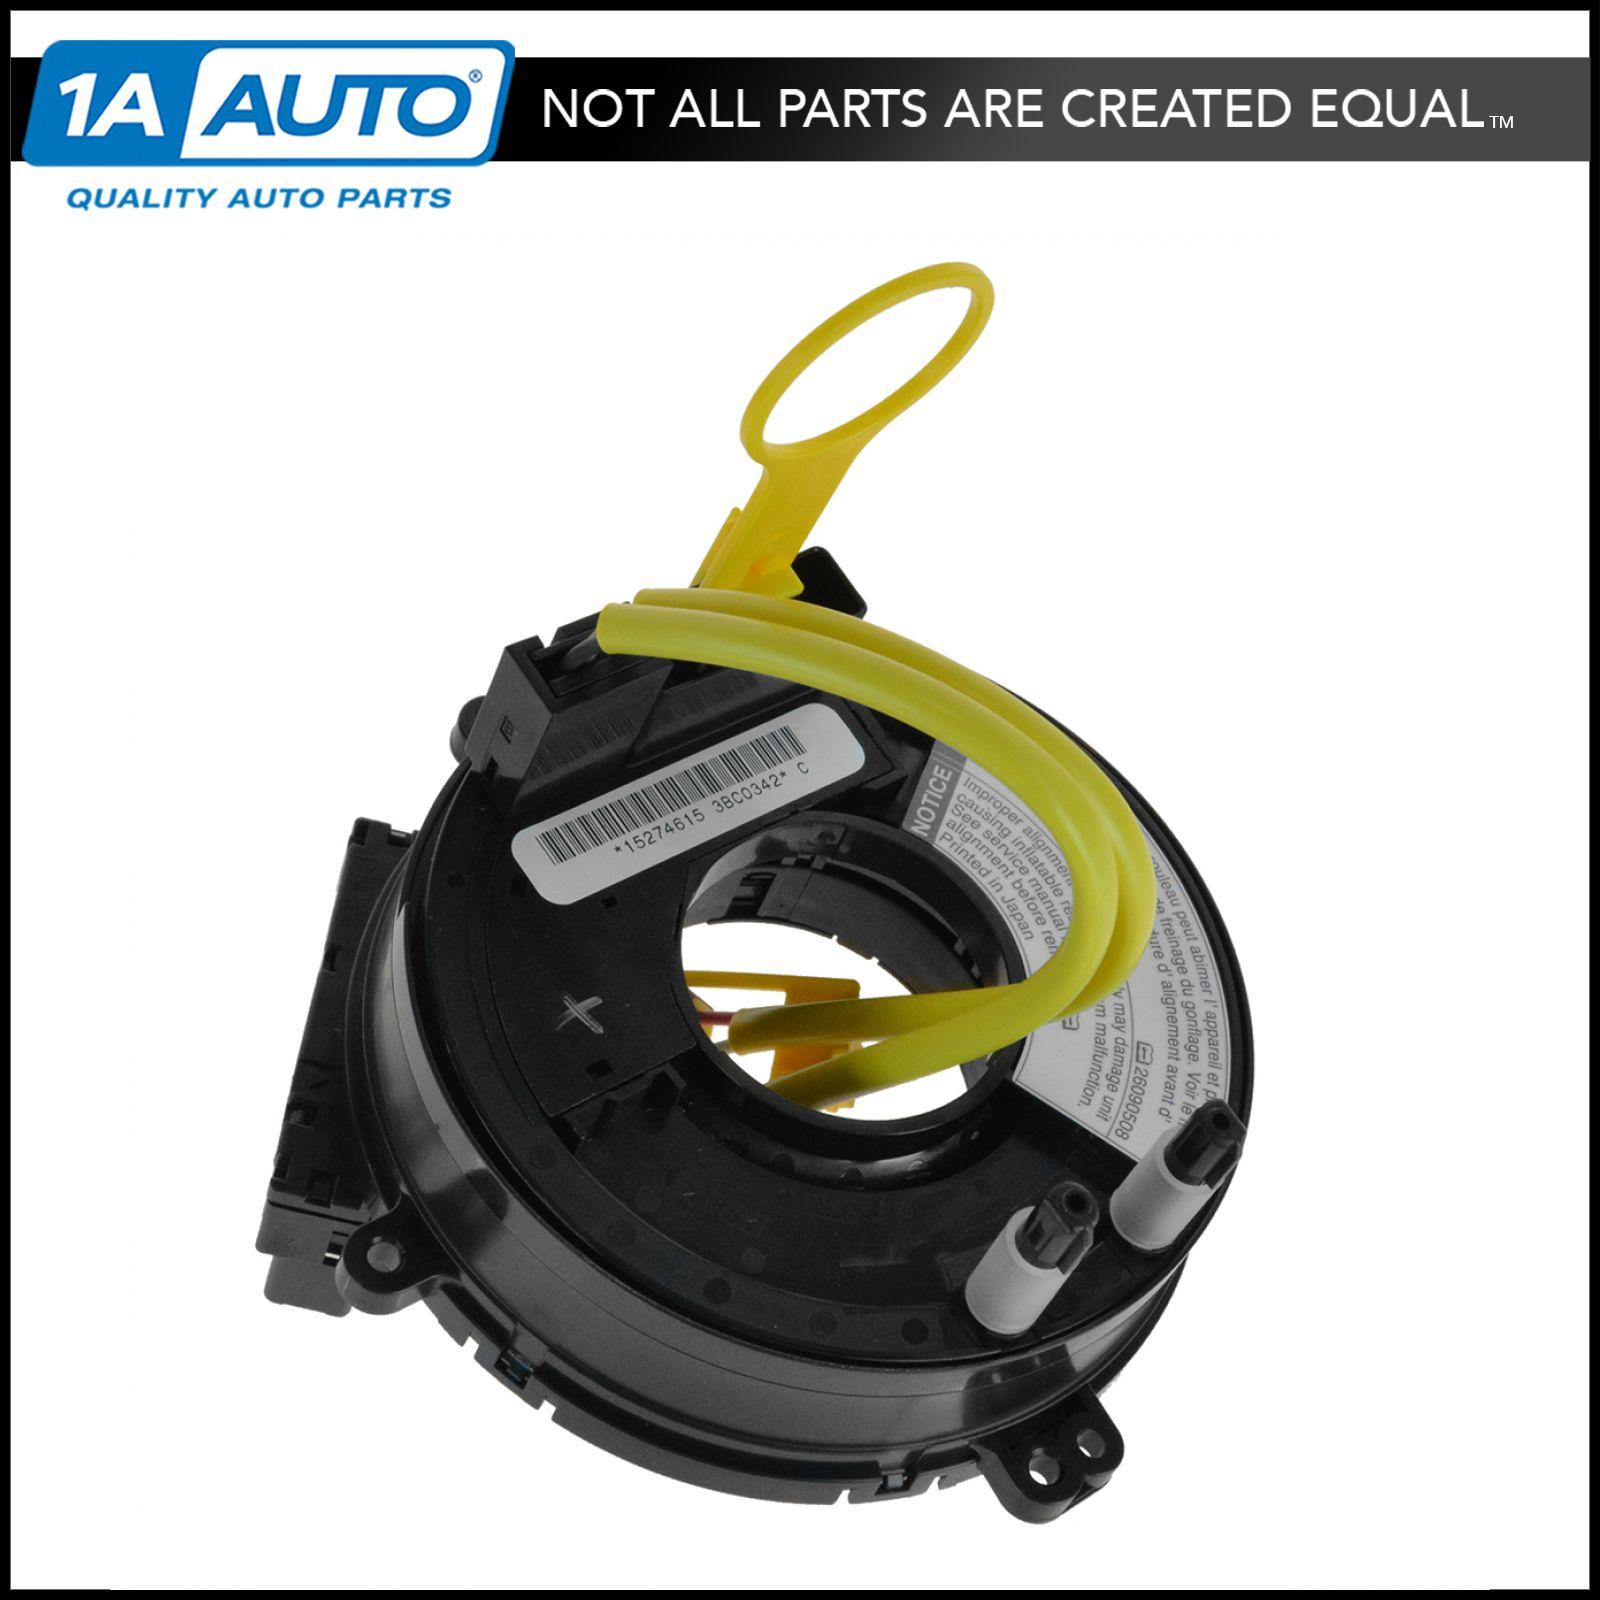 07 pontiac g6 service airbag